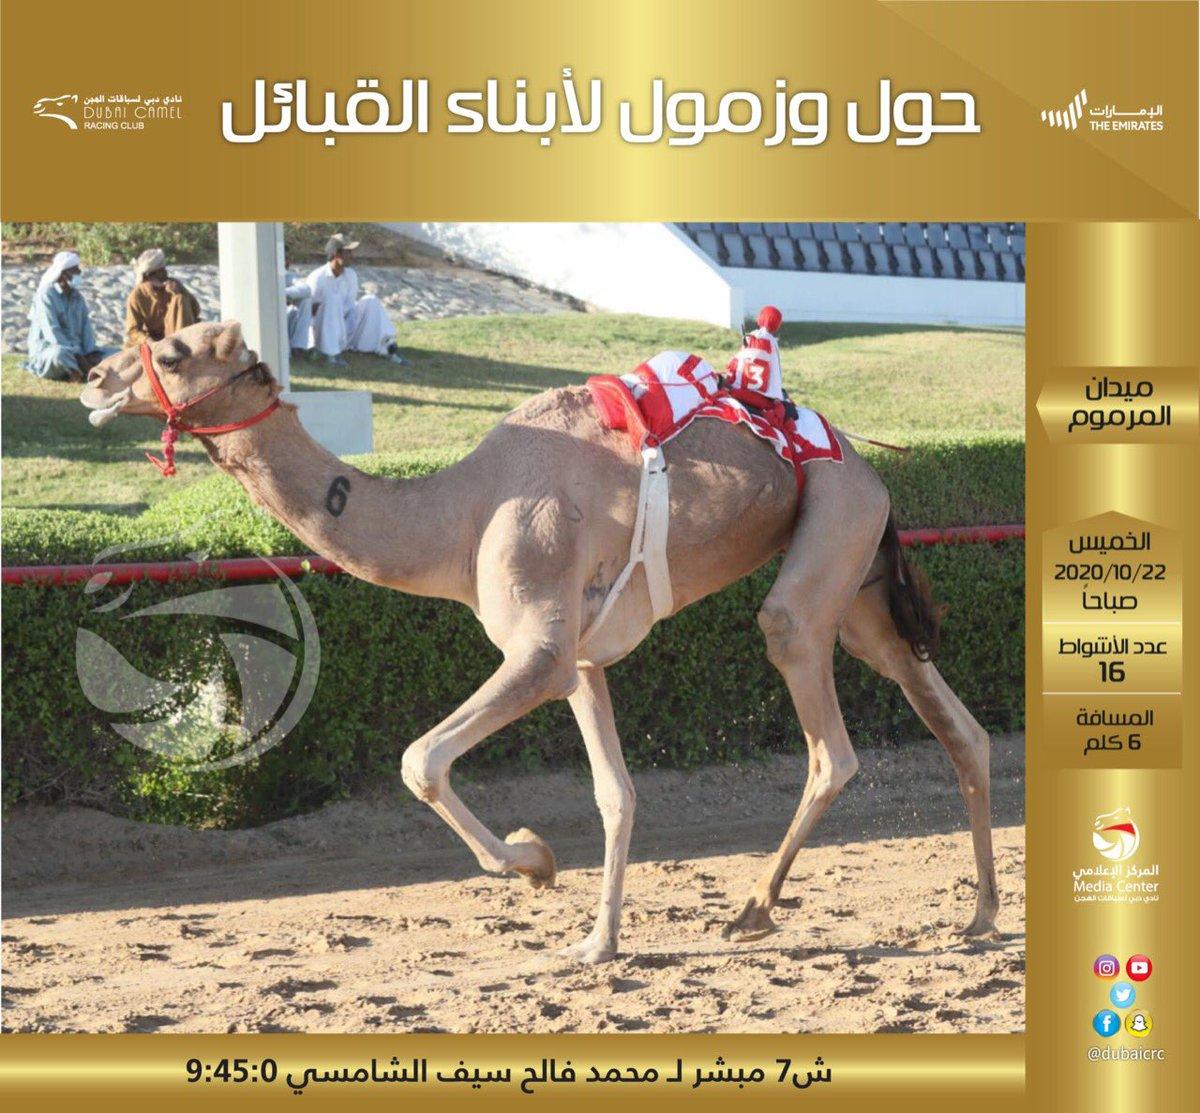 #نادي_دبي_لسباقات_الهجن #المركز_الاعلامي #فزاع #faz3  #almarmoom #Dubaicrc #camel #Racing_club #Dubai #VisitDubai  #uae #Camelrace #sports #fun #camels #heritage #race #tourism #emirates #photography #dubailife #DCRC #mydubai https://t.co/0a5NBBrwoJ